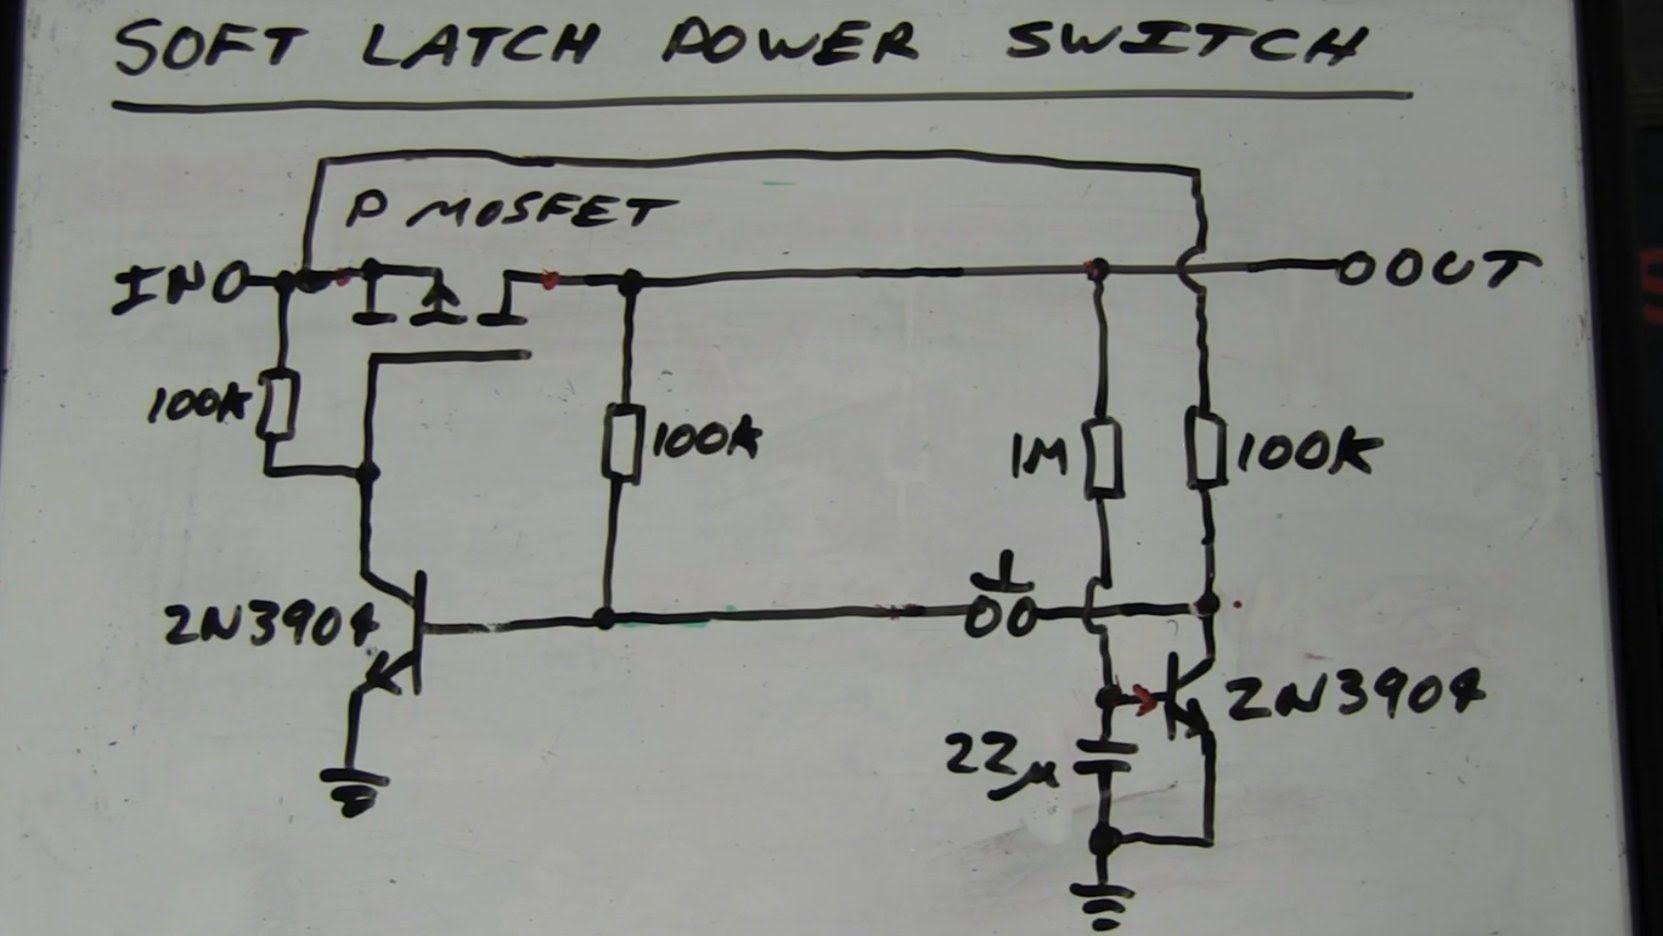 medium resolution of eevblog 262 world s simplest soft latching power switch circuit